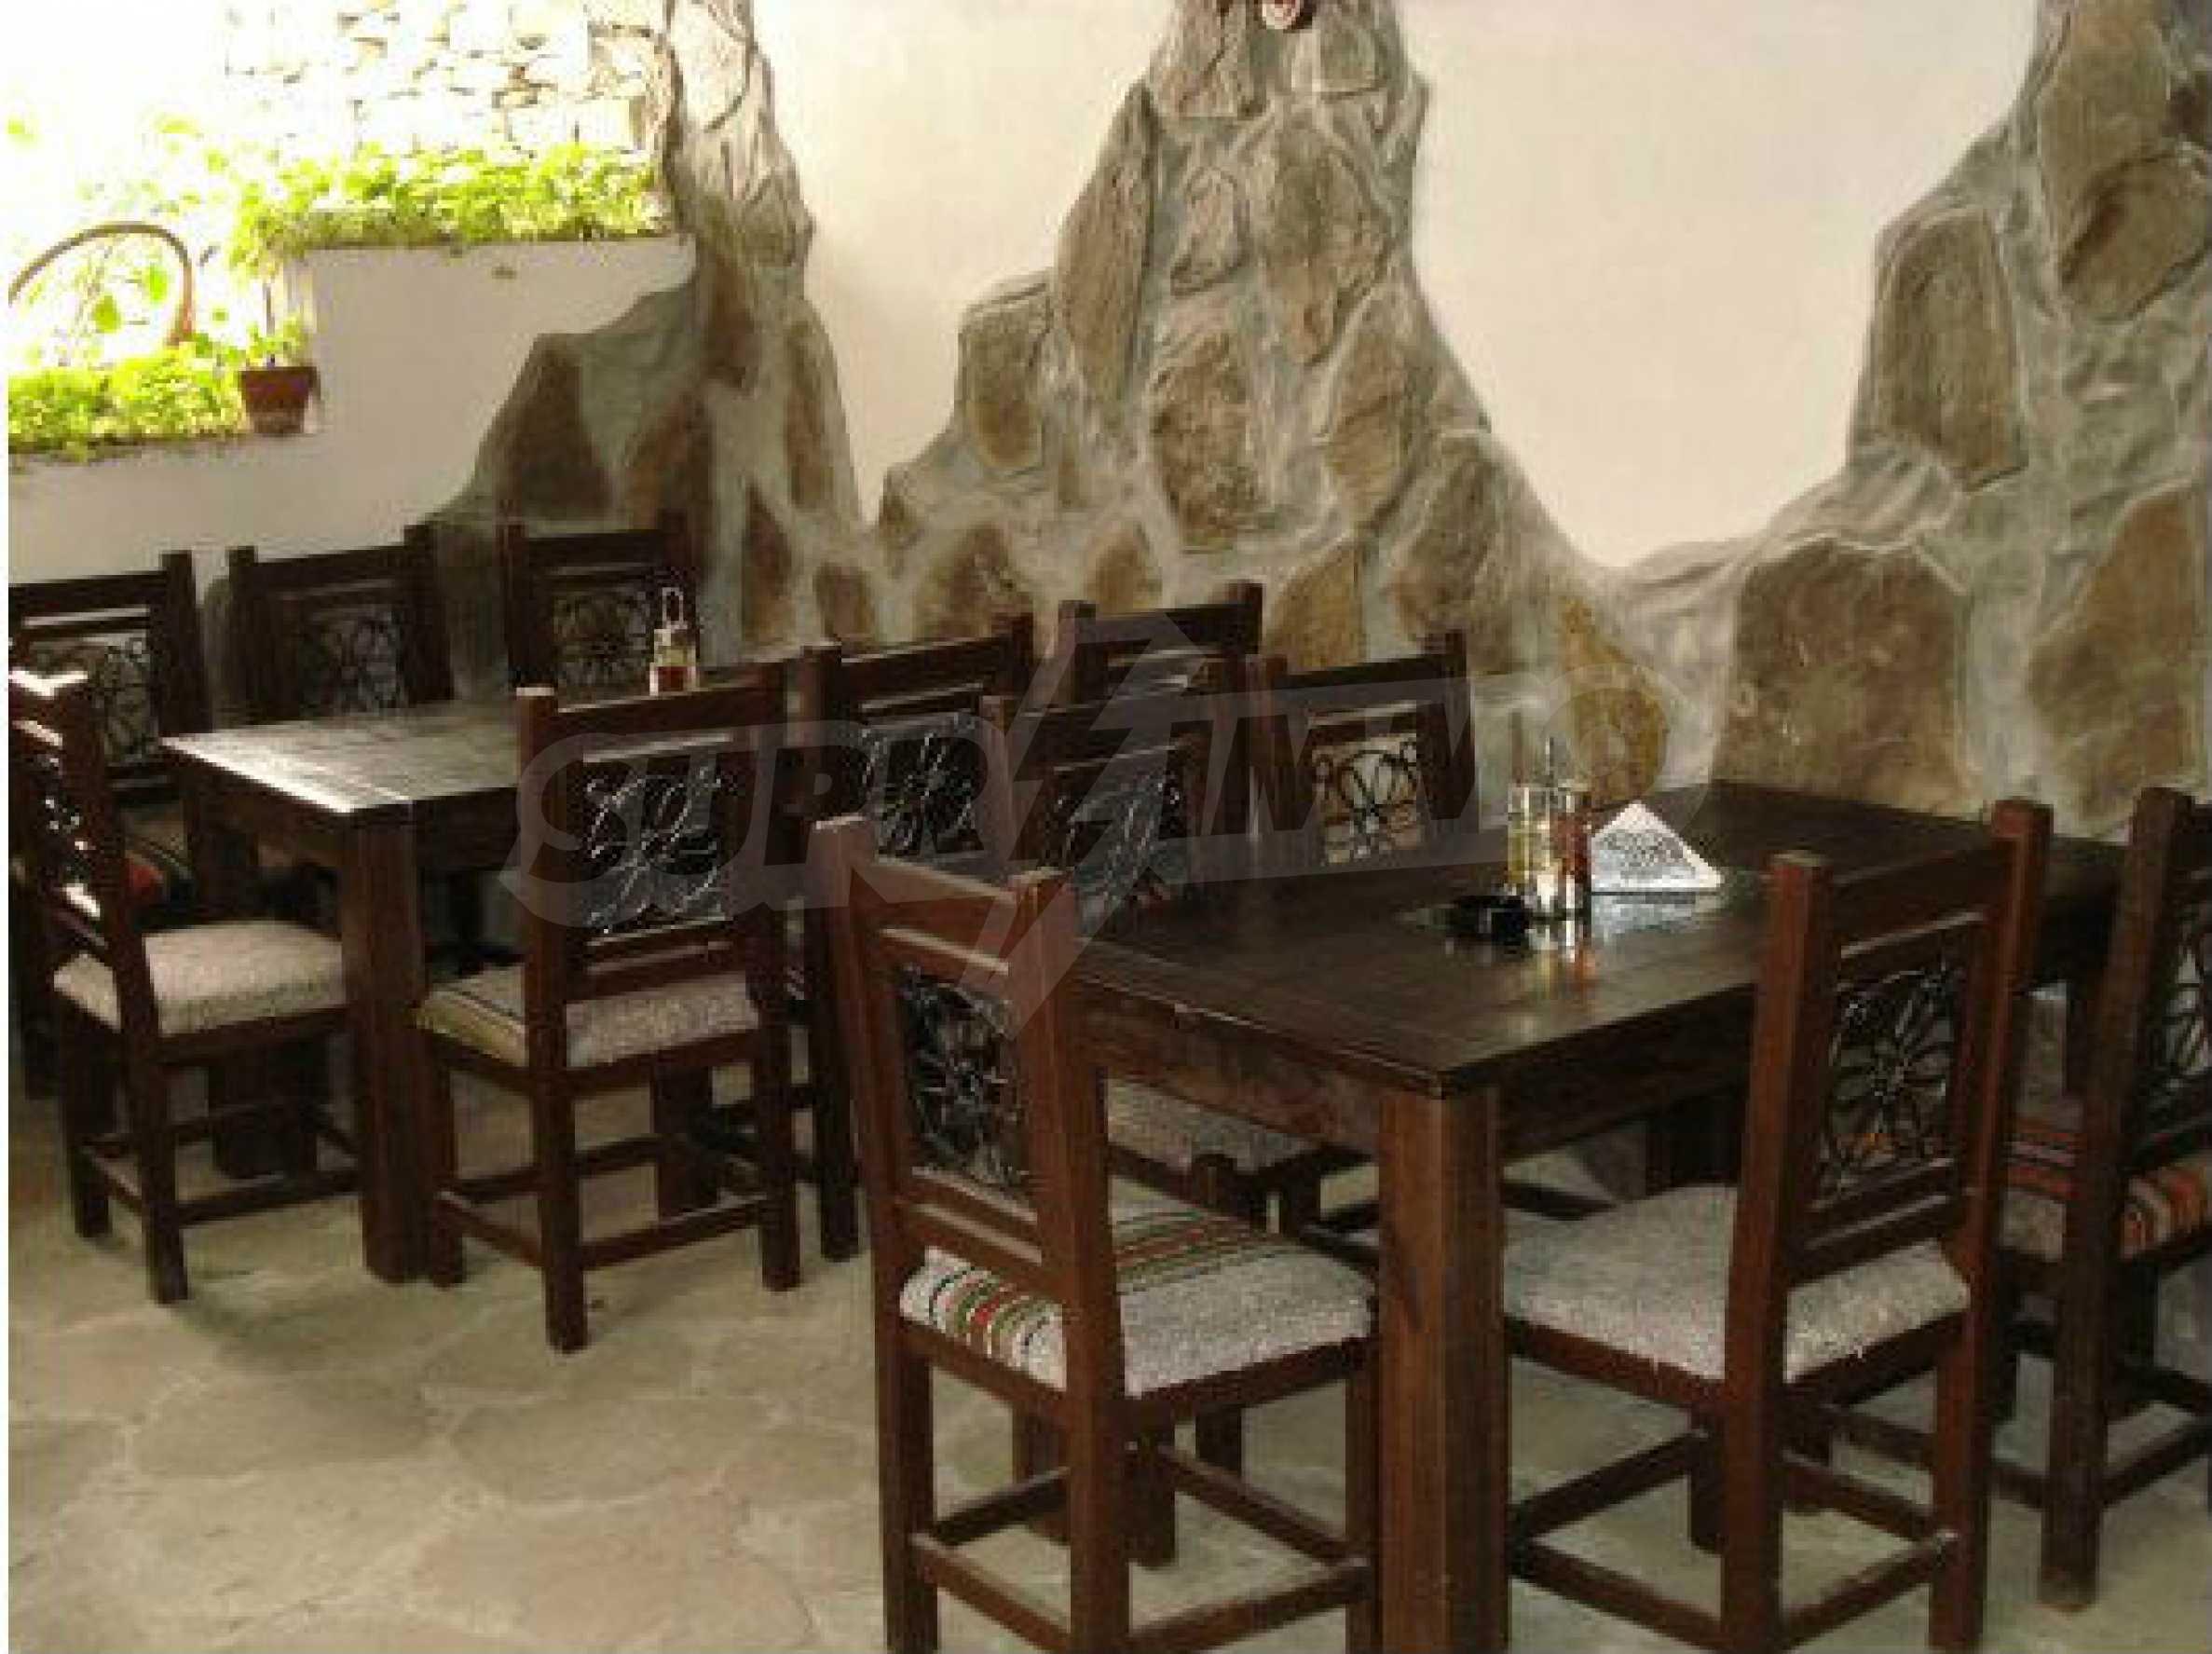 Hotelanlage mit Restaurant am Ufer des Flusses Osam in Lovech 69